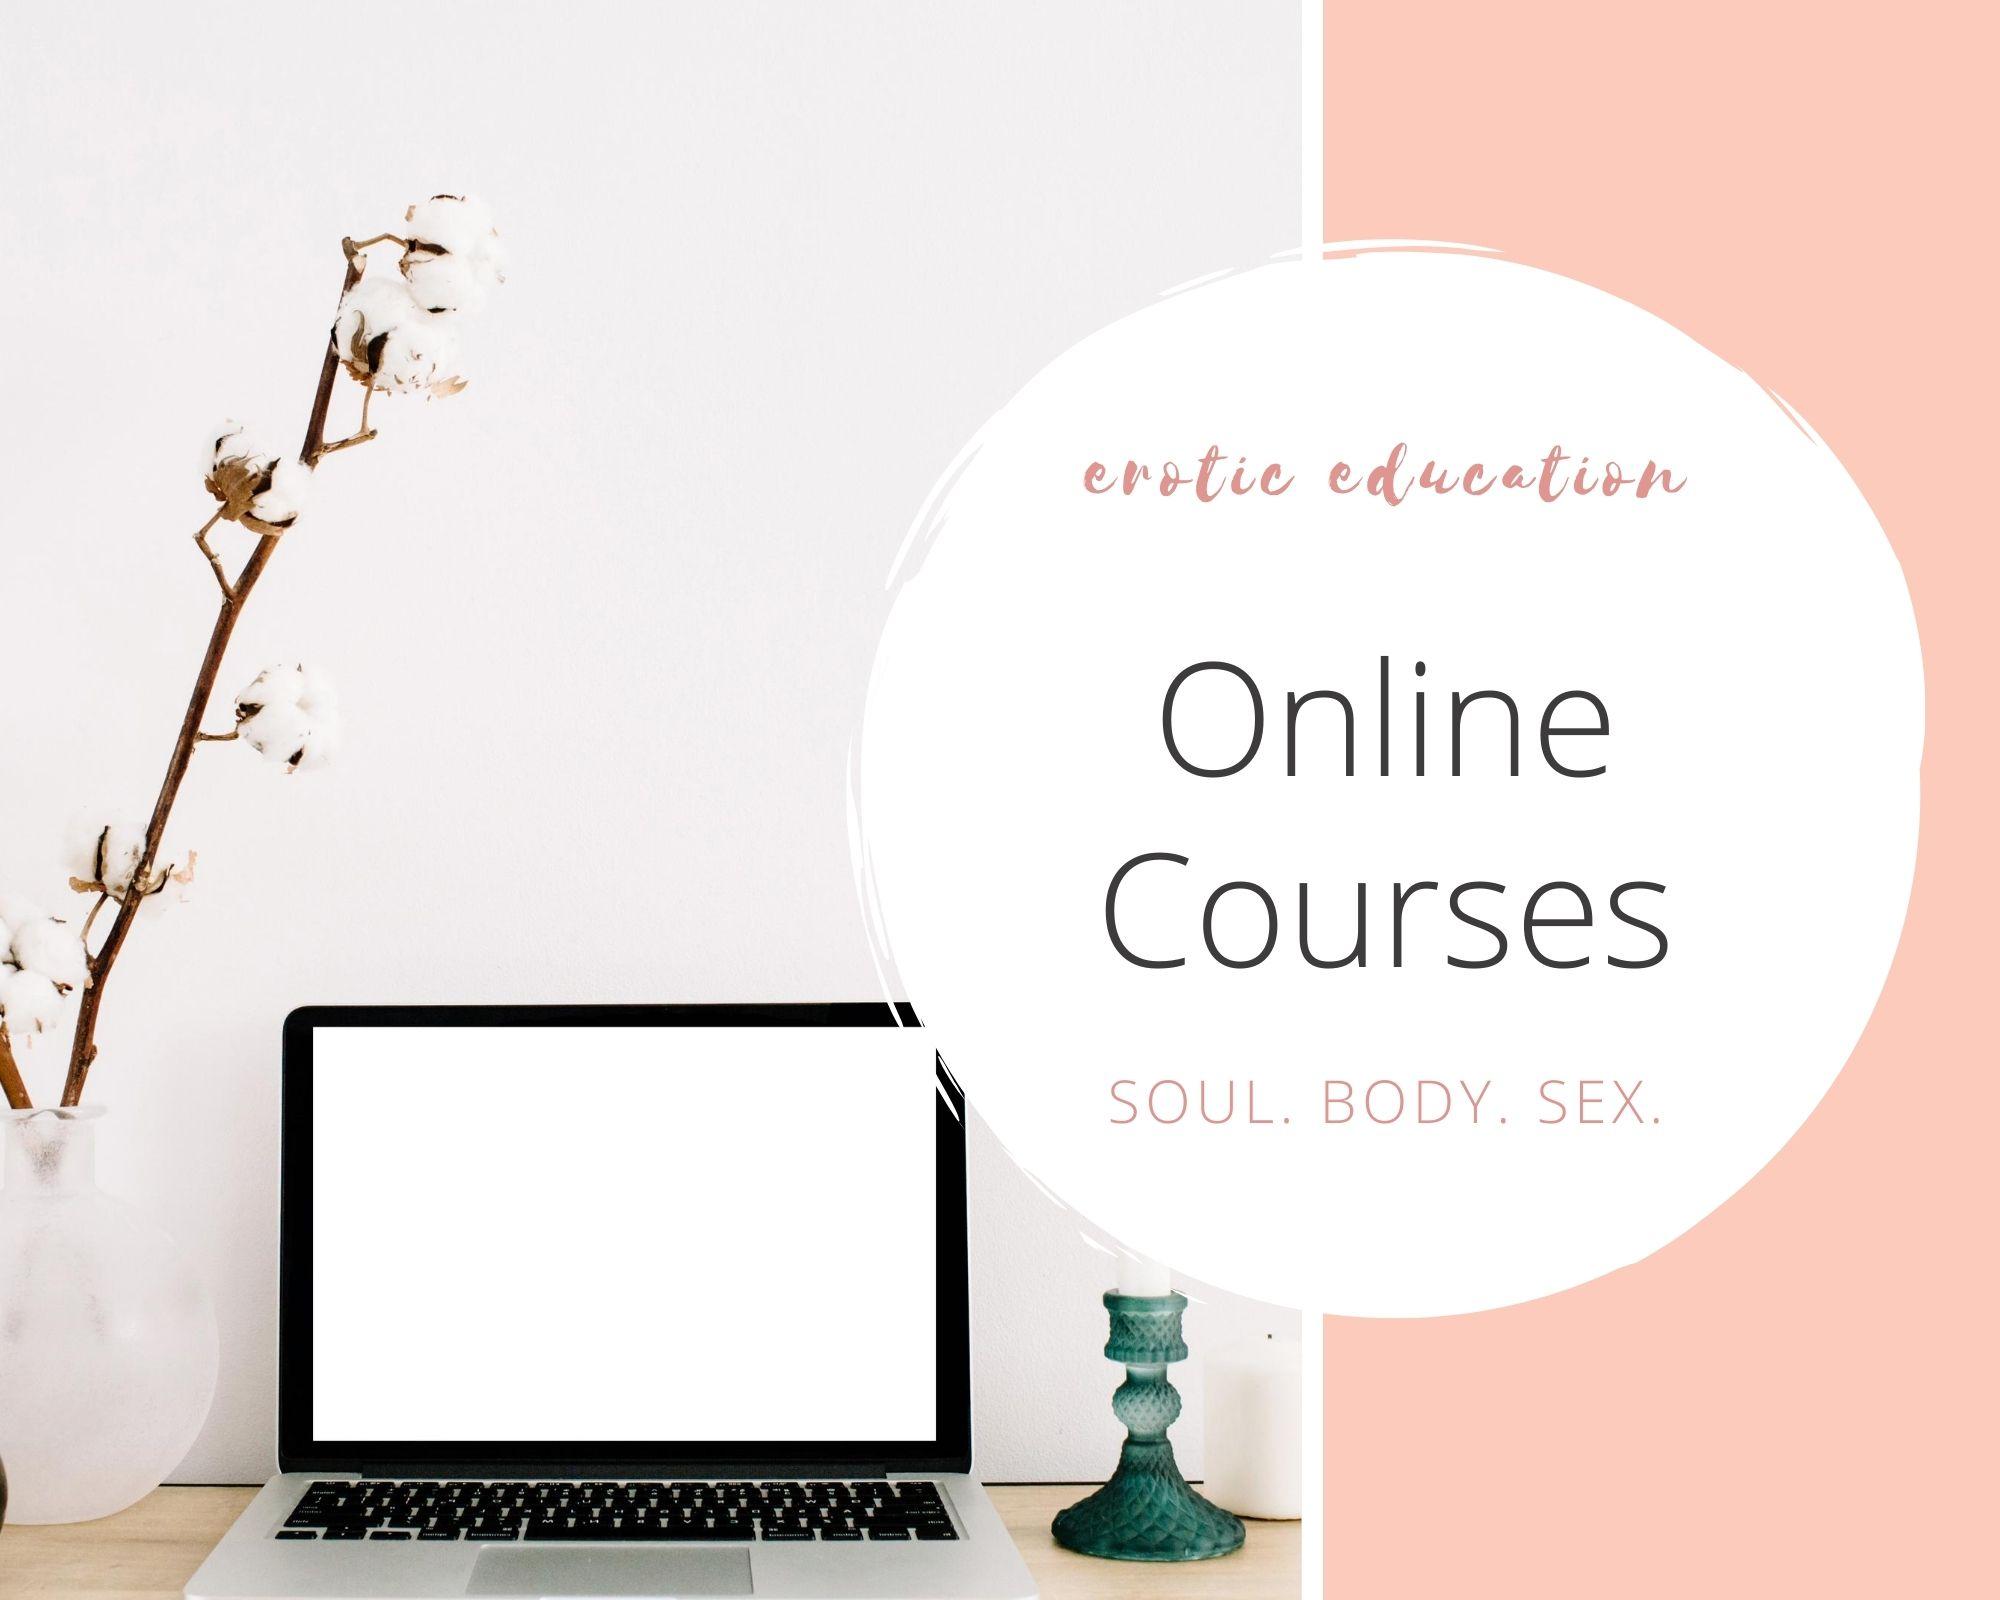 online courses, erotic courses, erotic education, online classes